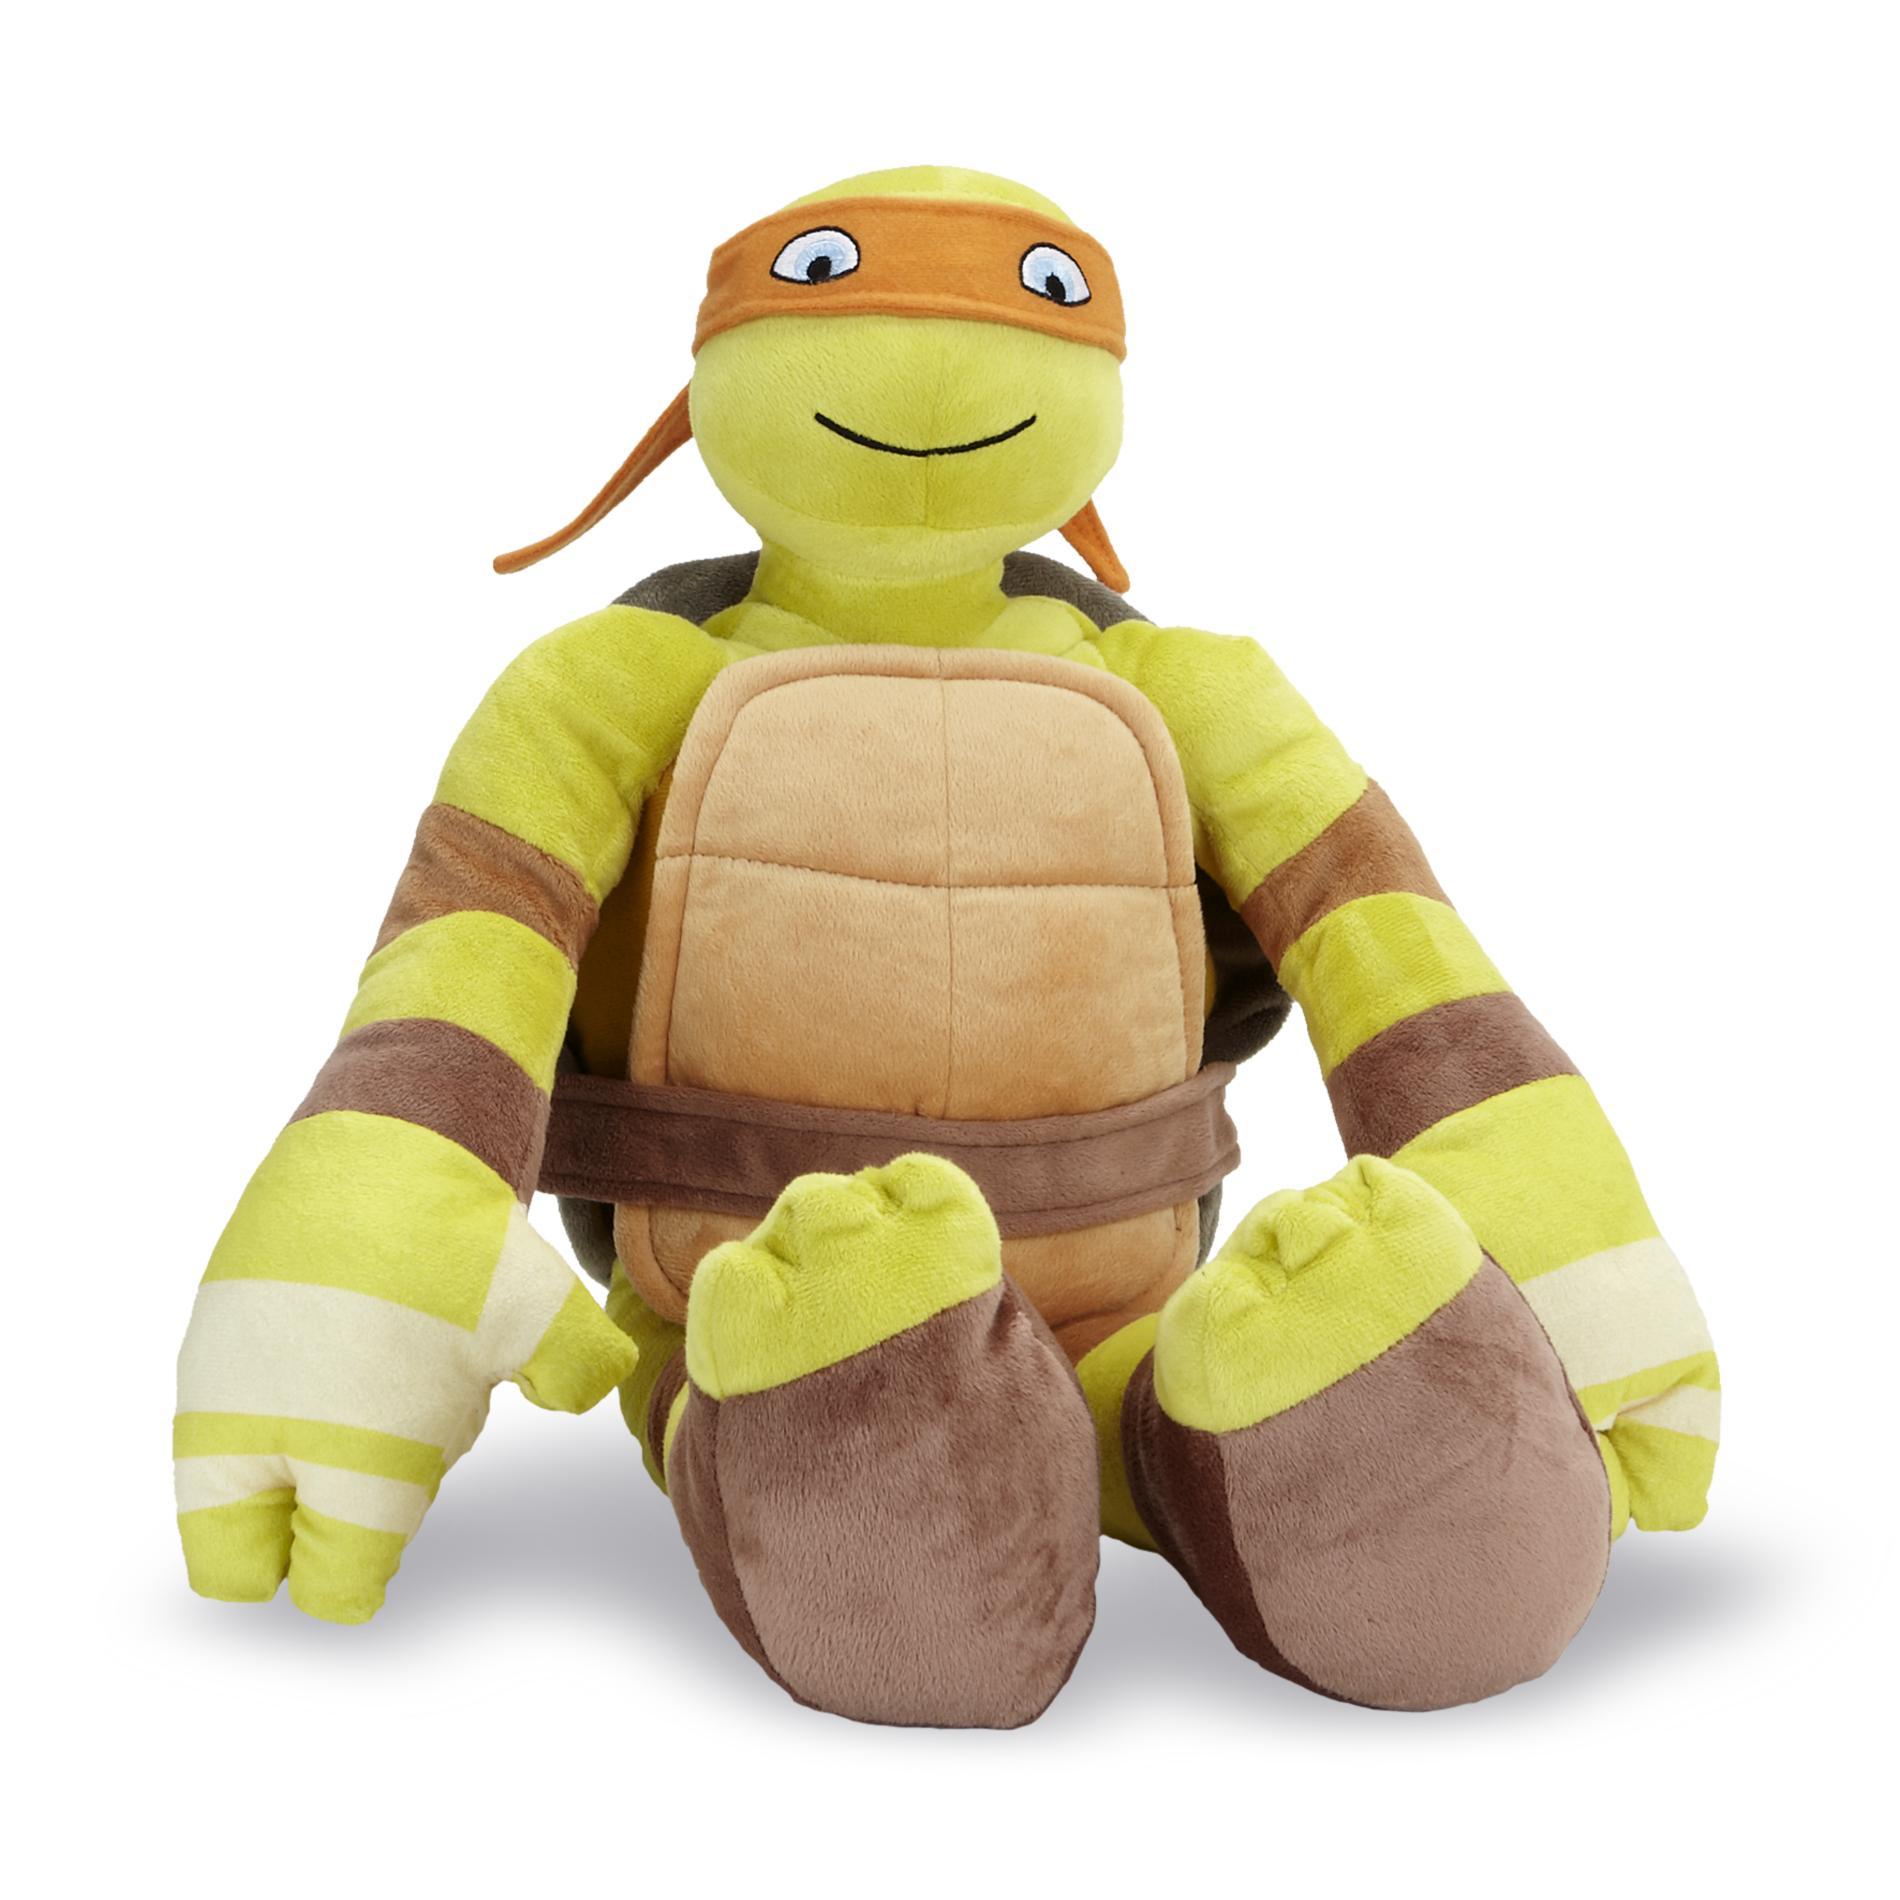 Mutant Ninja Turtle Cuddle Pillow: Best Cuddle Buddy Only